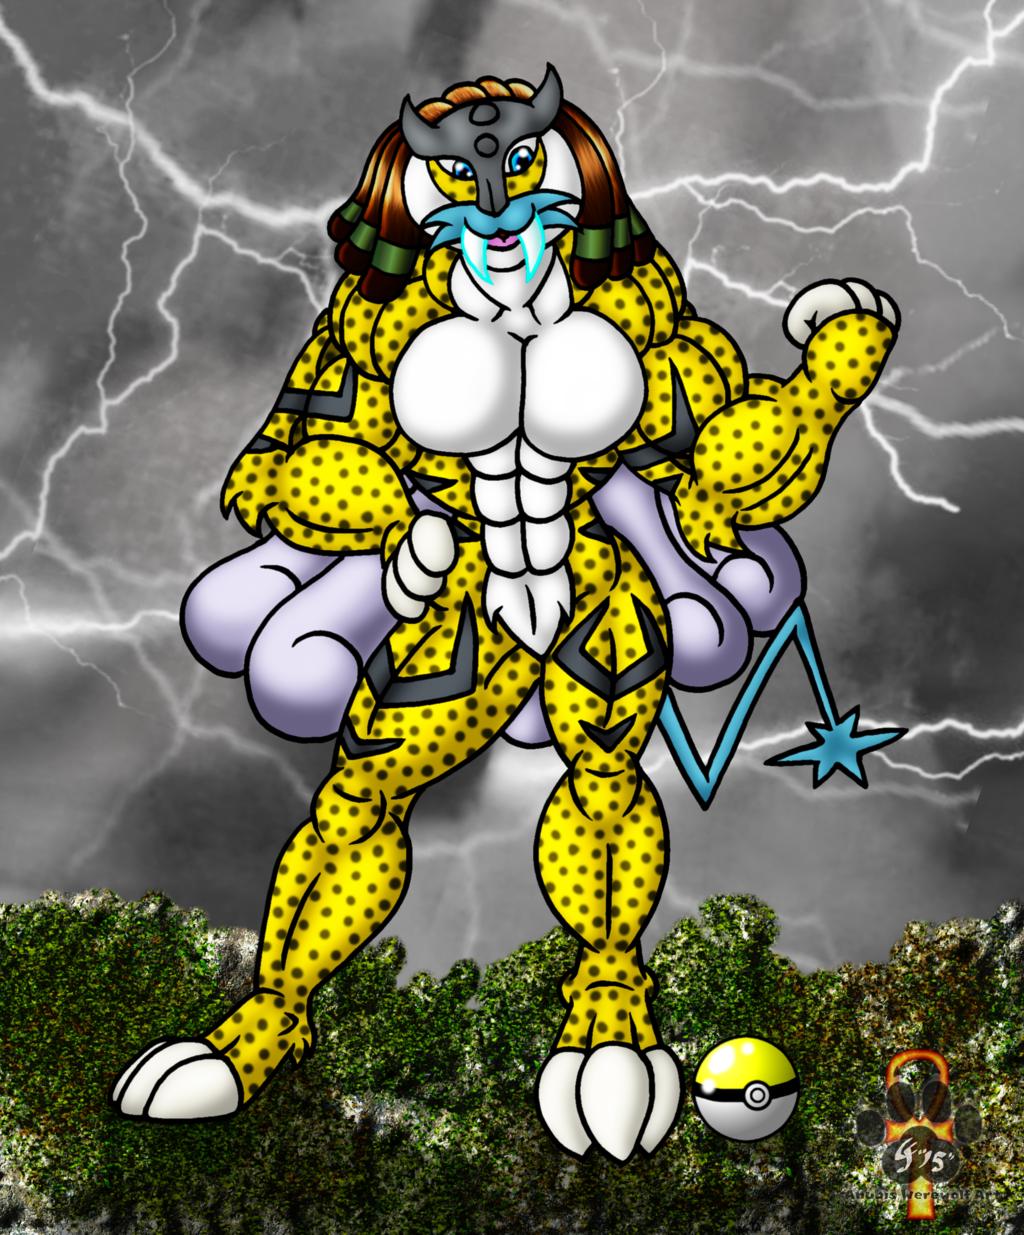 The Cheetah Raikou